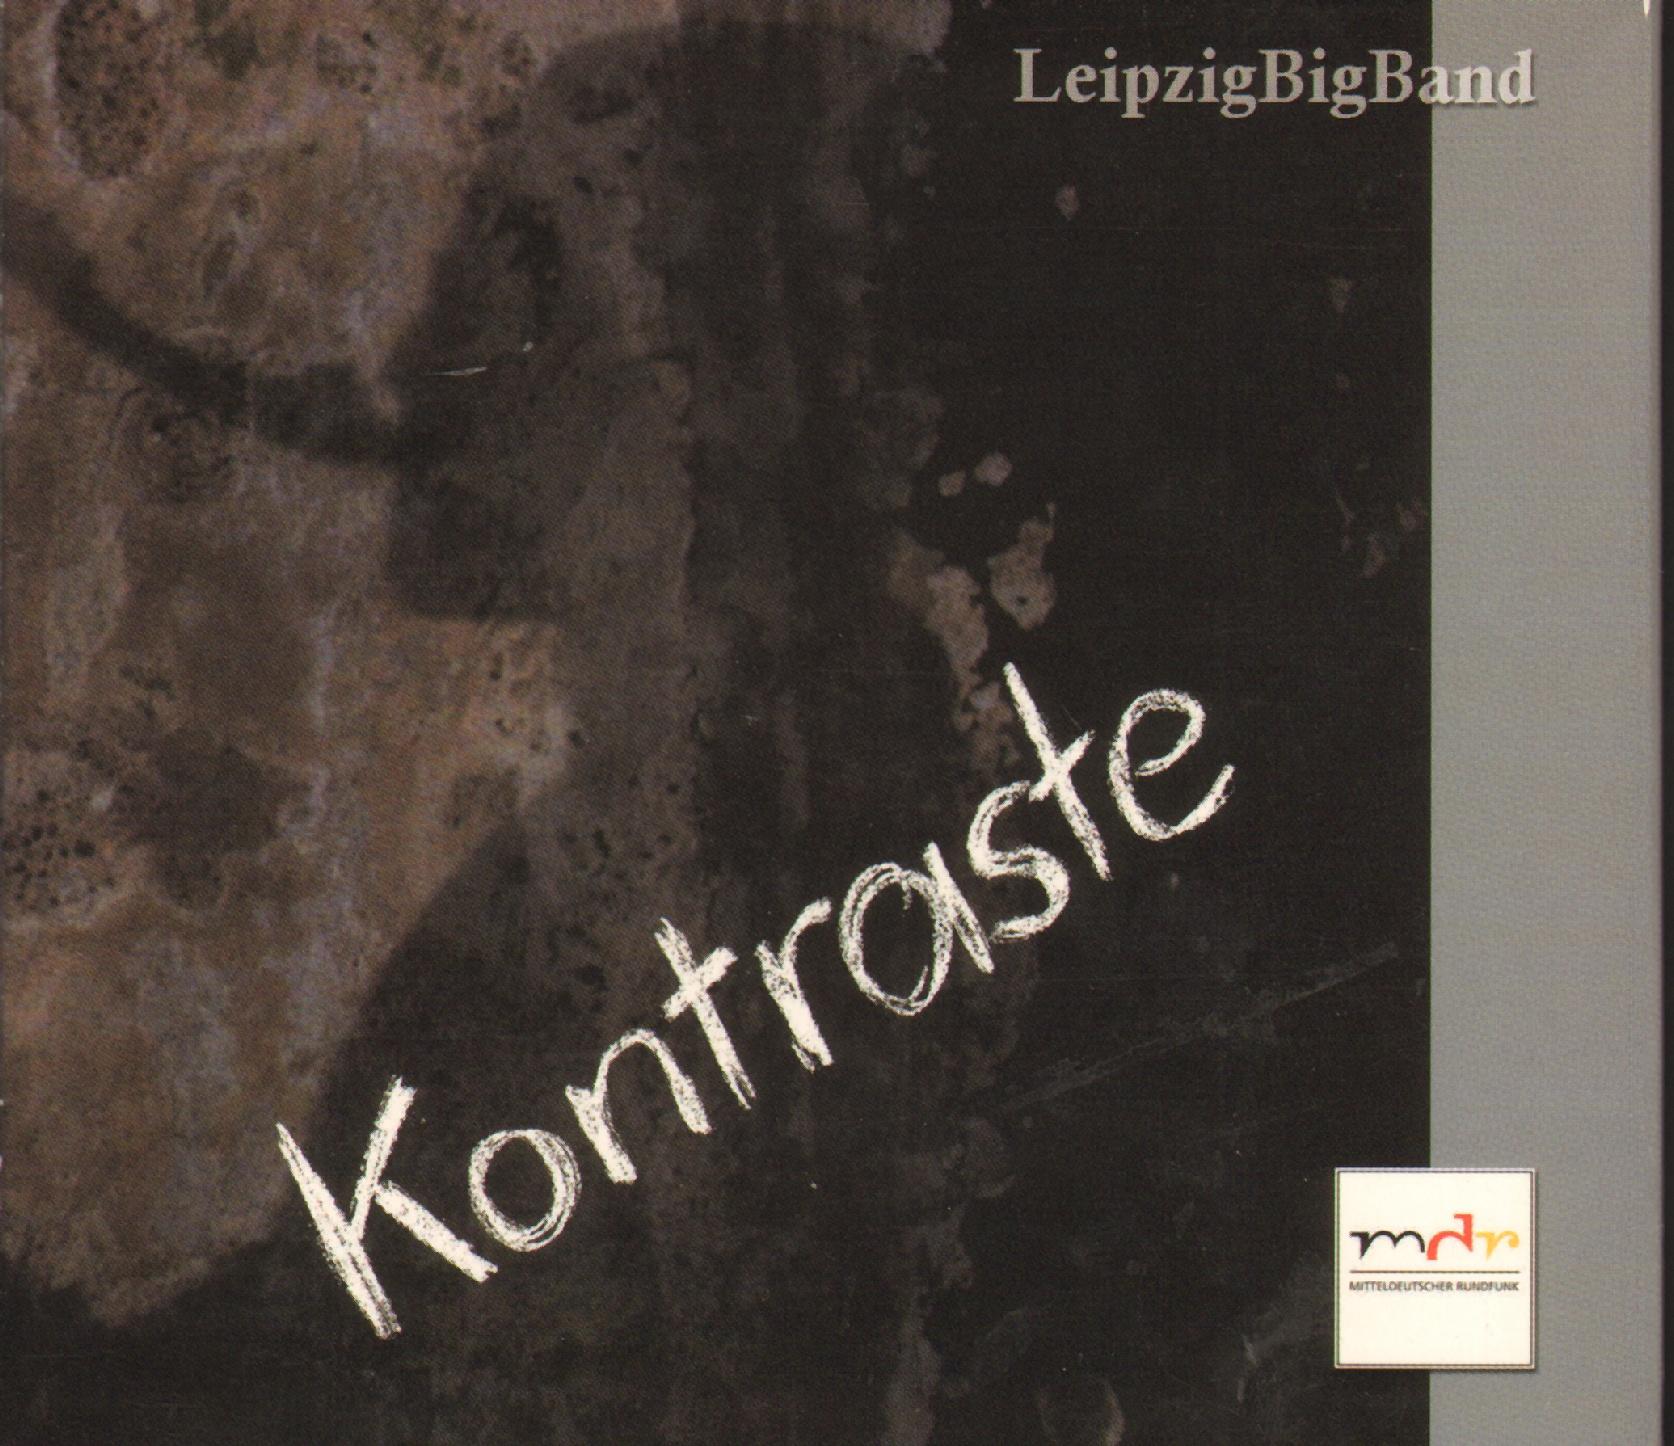 Leipzig BigBand | Kontraste, MDR 2002